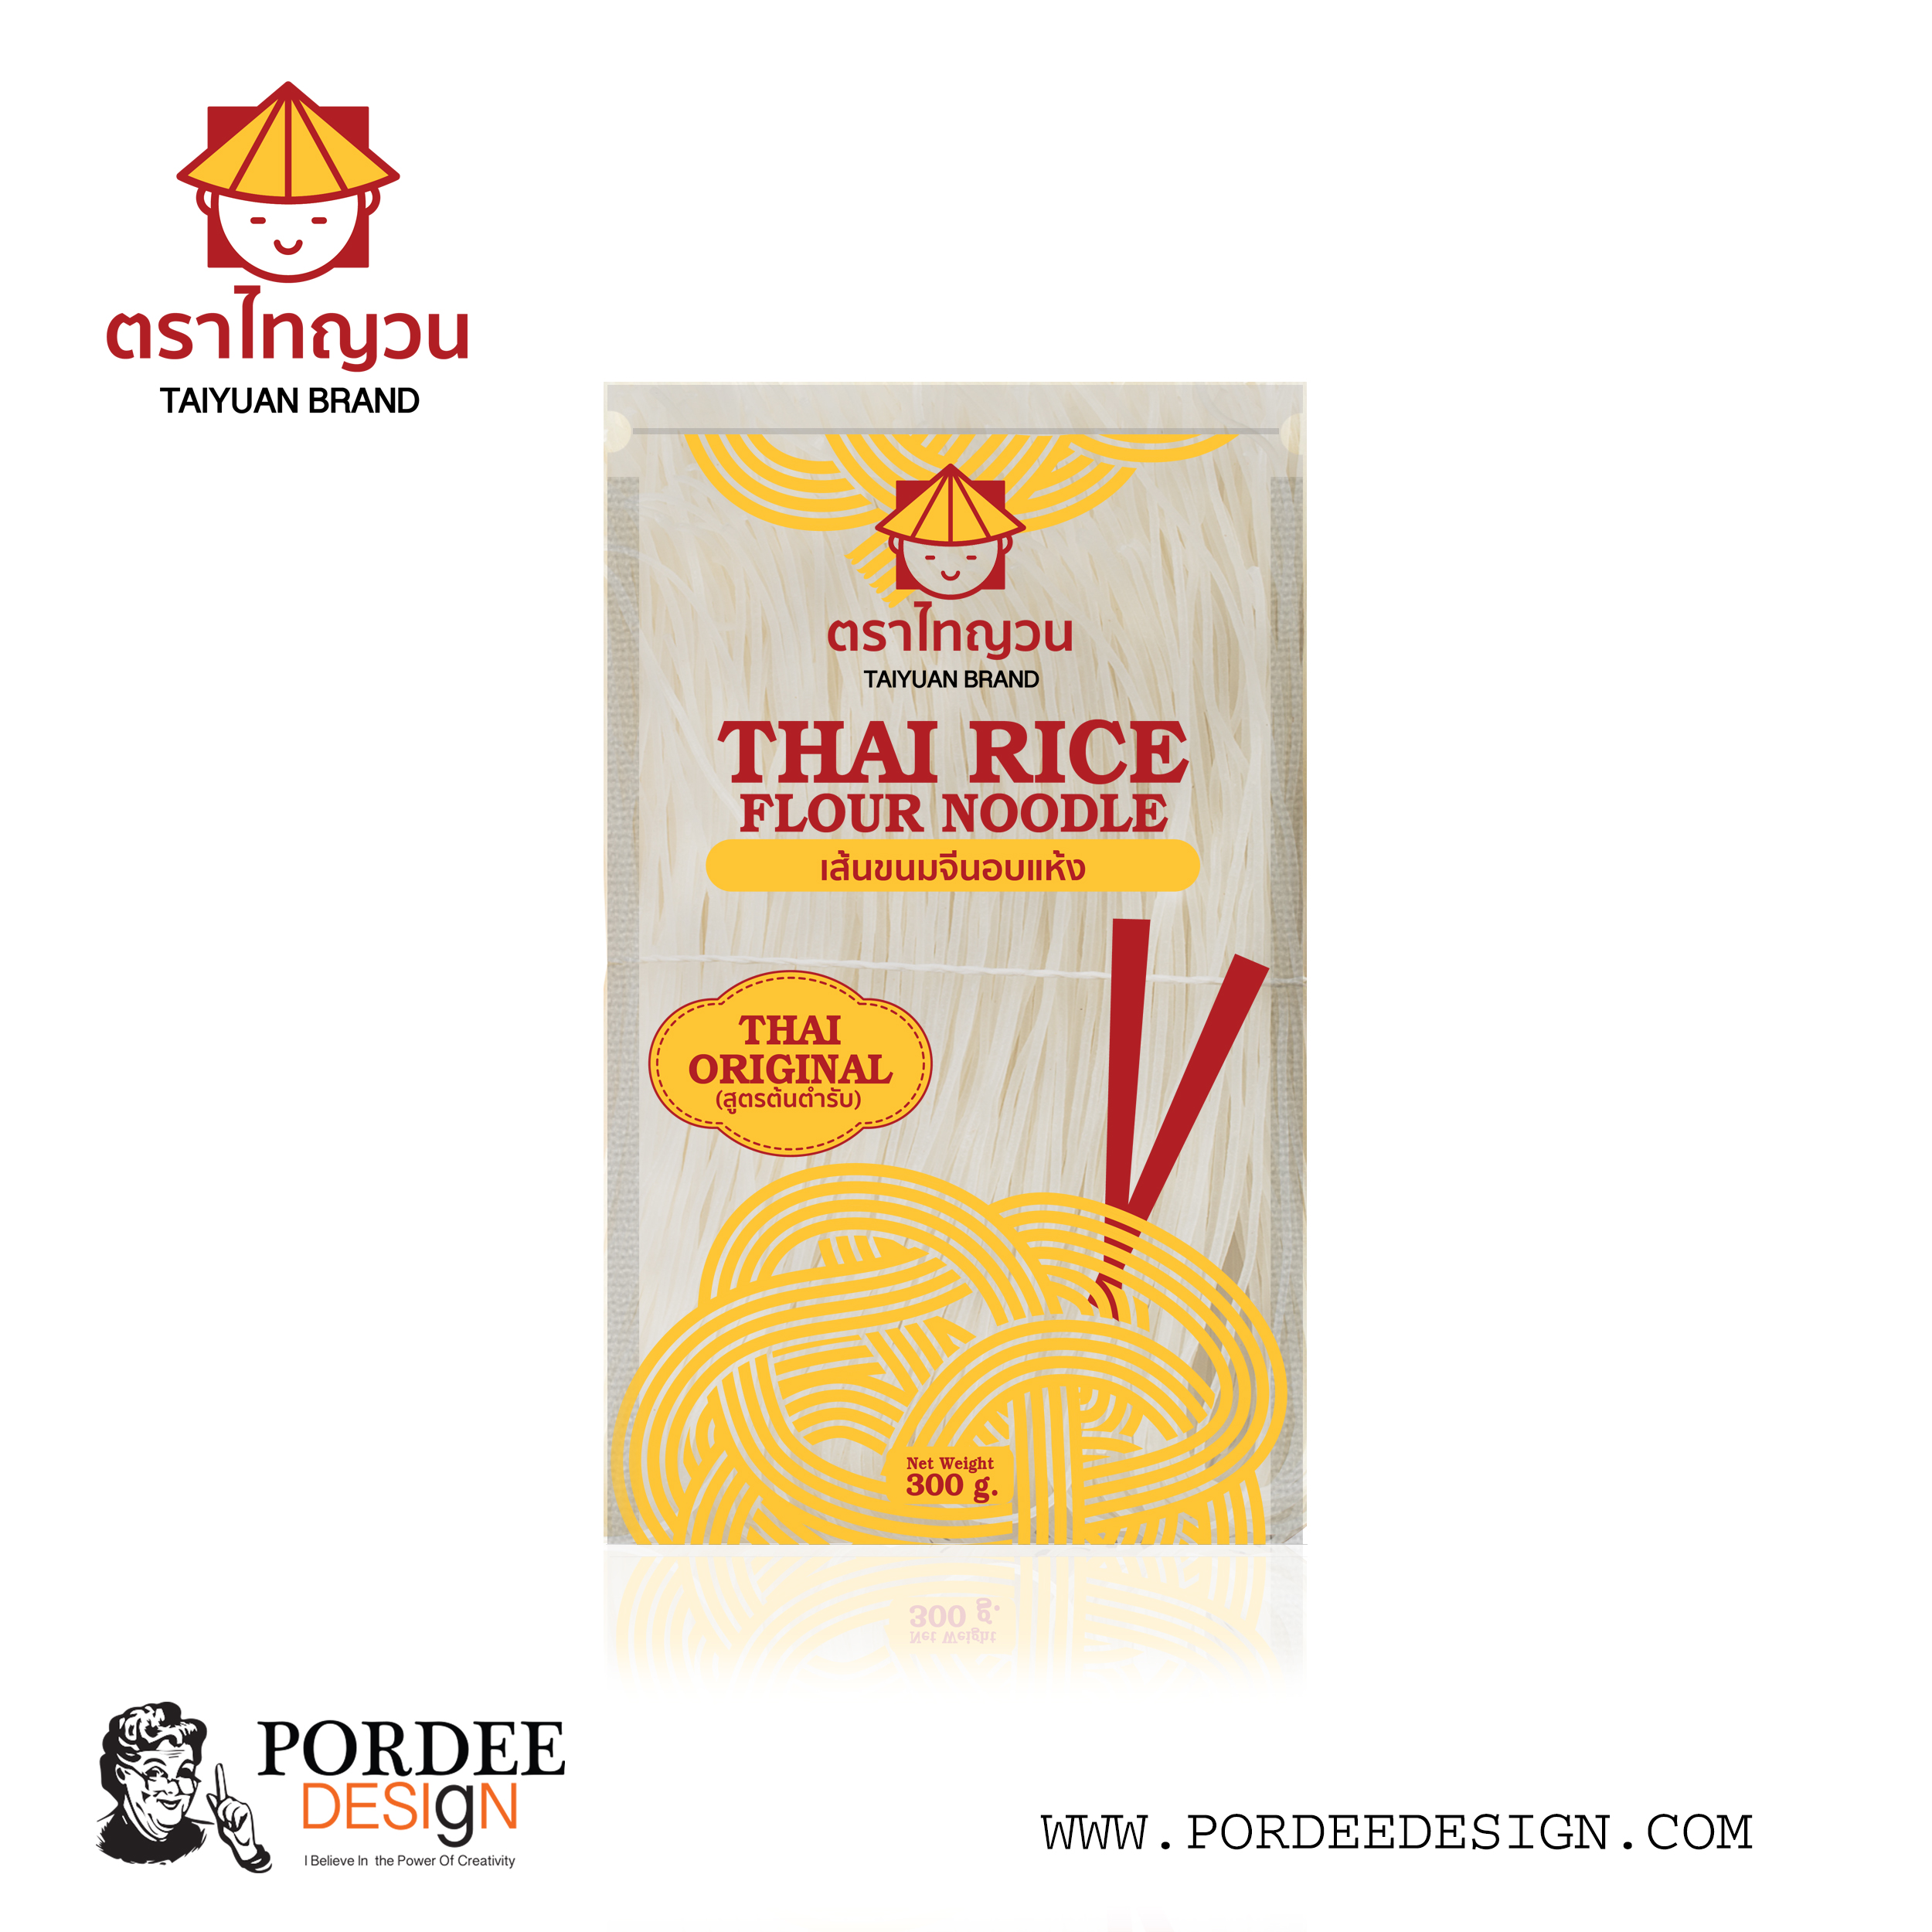 plastic-bag-mockup-ขนมจีน